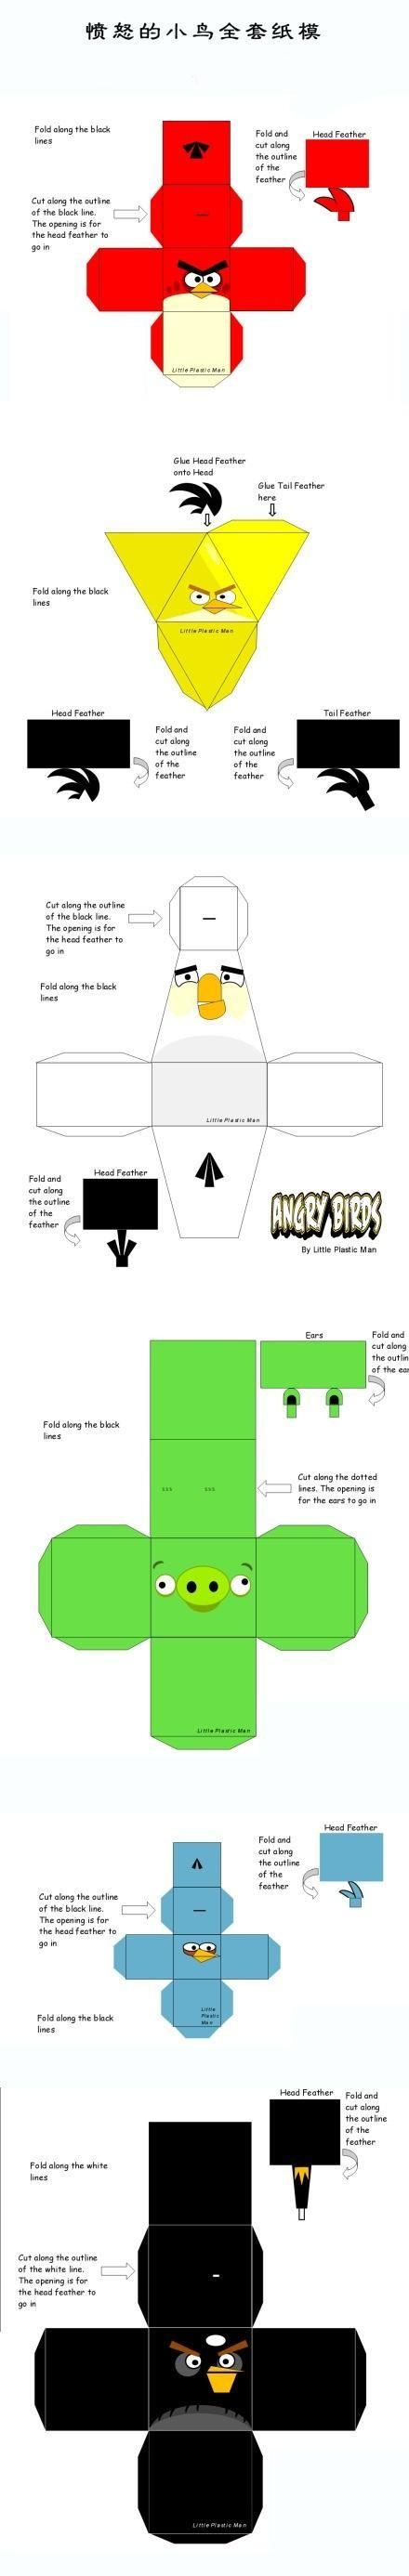 Angry Birds Papercraft Kit Festa Angry Birds Para Imprimir Grátis